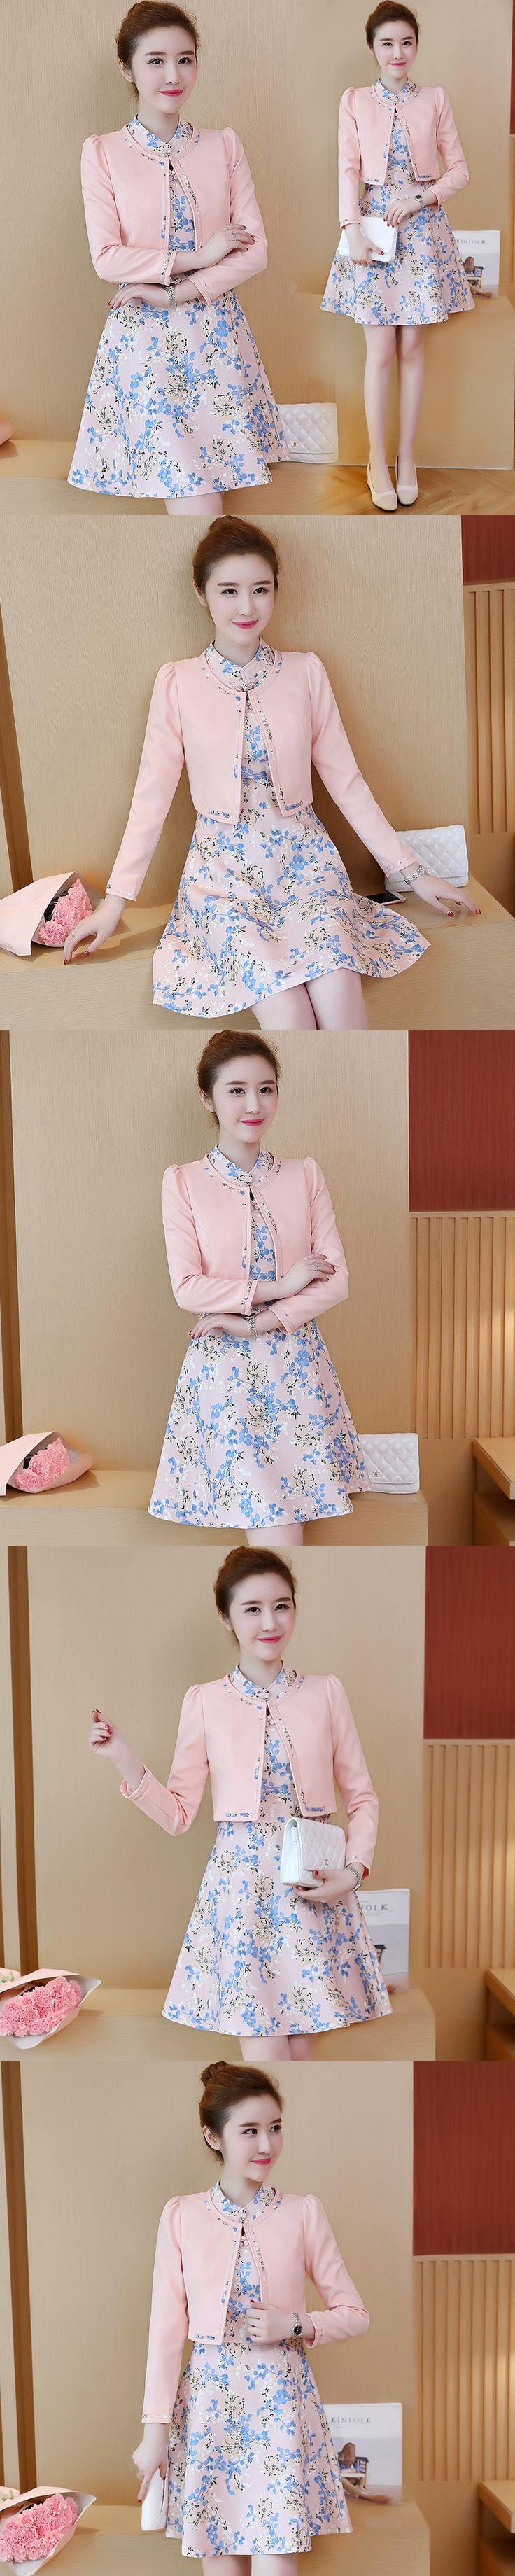 new women's clothing korean fashion office lady brief small coat & print dress two-piece suit vestidos design clothes elegant